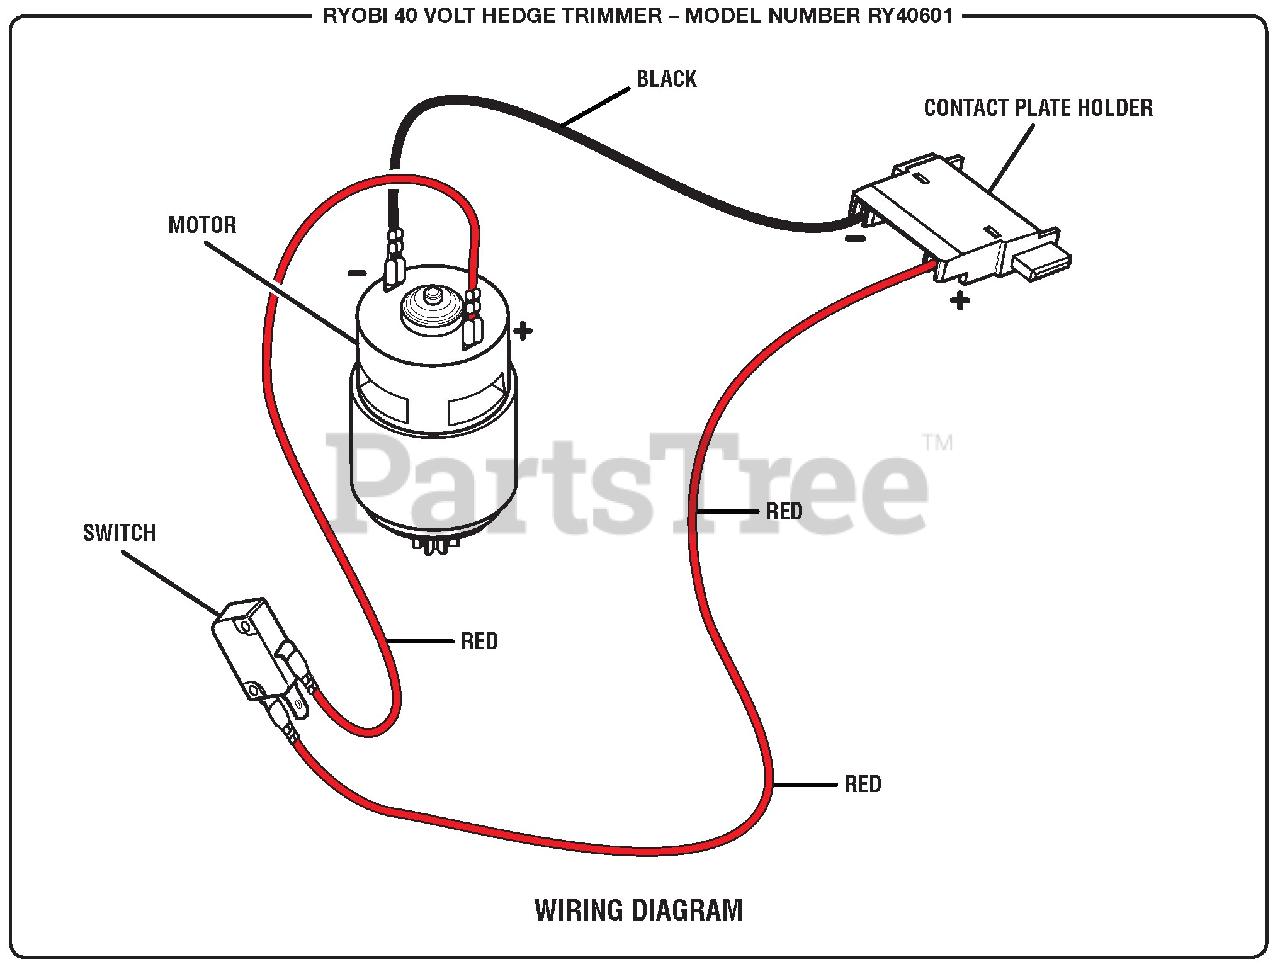 [DIAGRAM_38IU]  Ryobi RY 40601 - Ryobi Hedge Trimmer Wiring Diagram Parts Lookup with  Diagrams | PartsTree | Trimmer Wiring Diagram |  | PartsTree